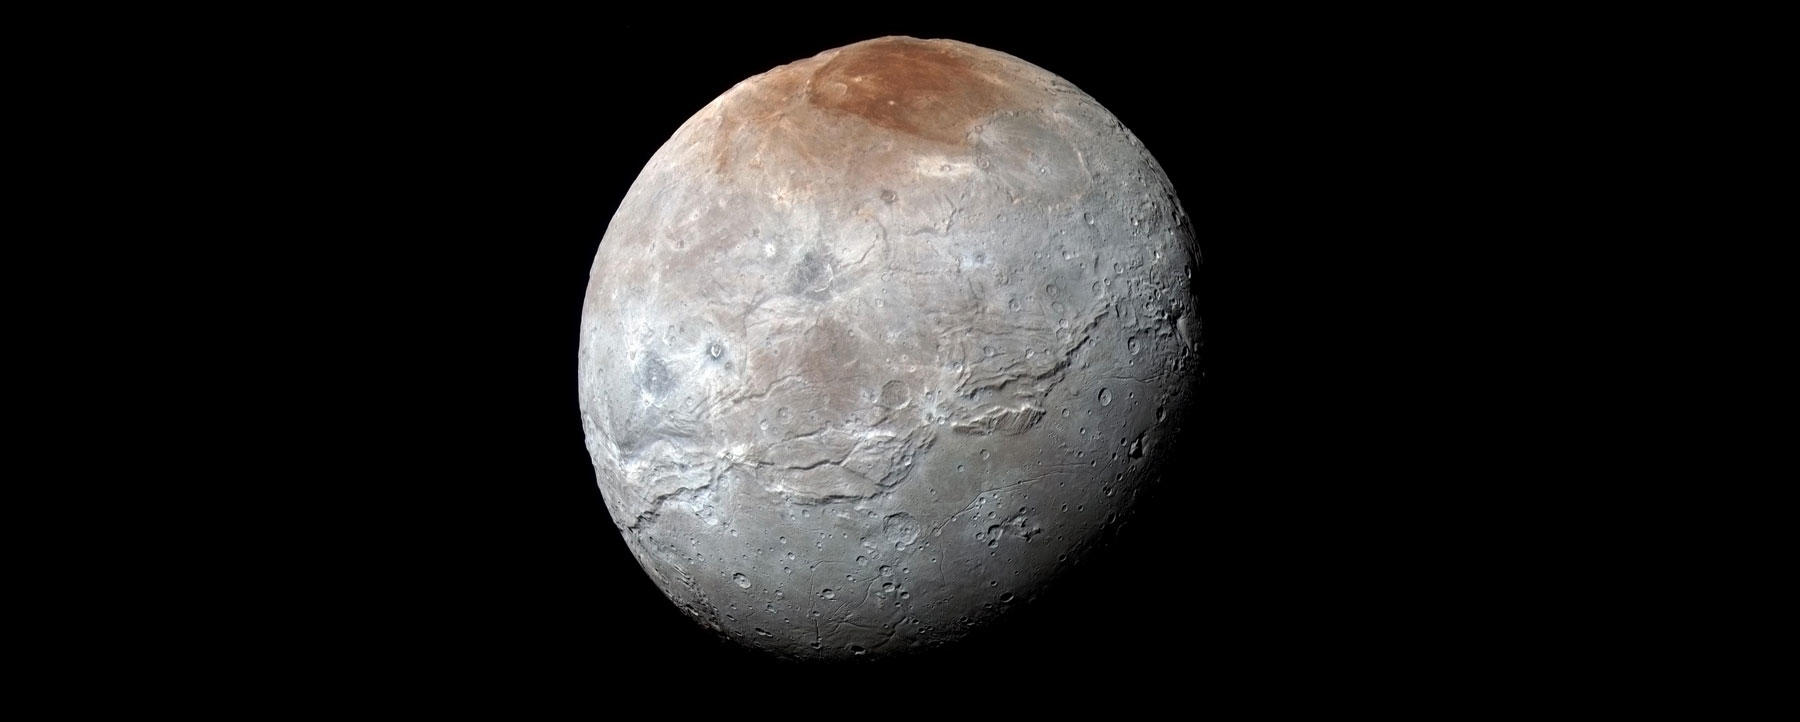 Charon from New Horizons